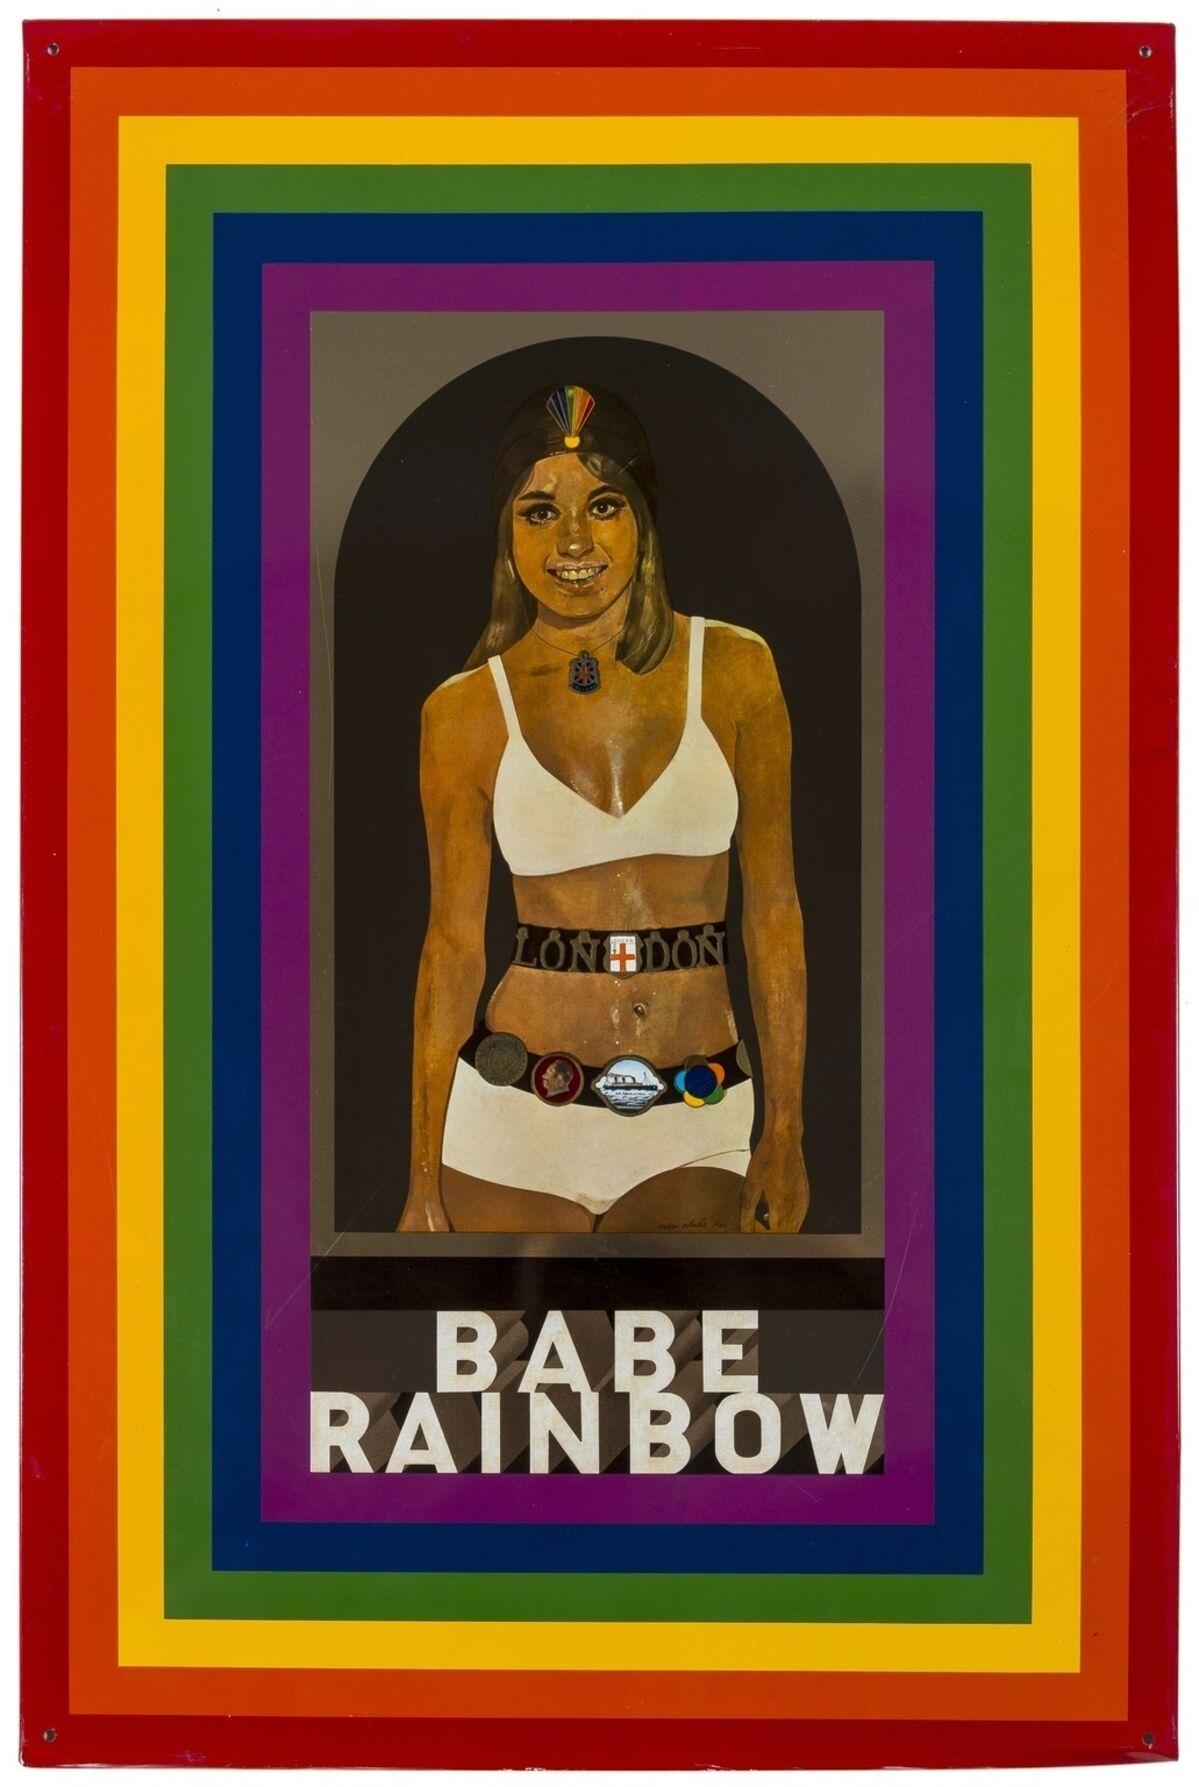 Babe Rainbow